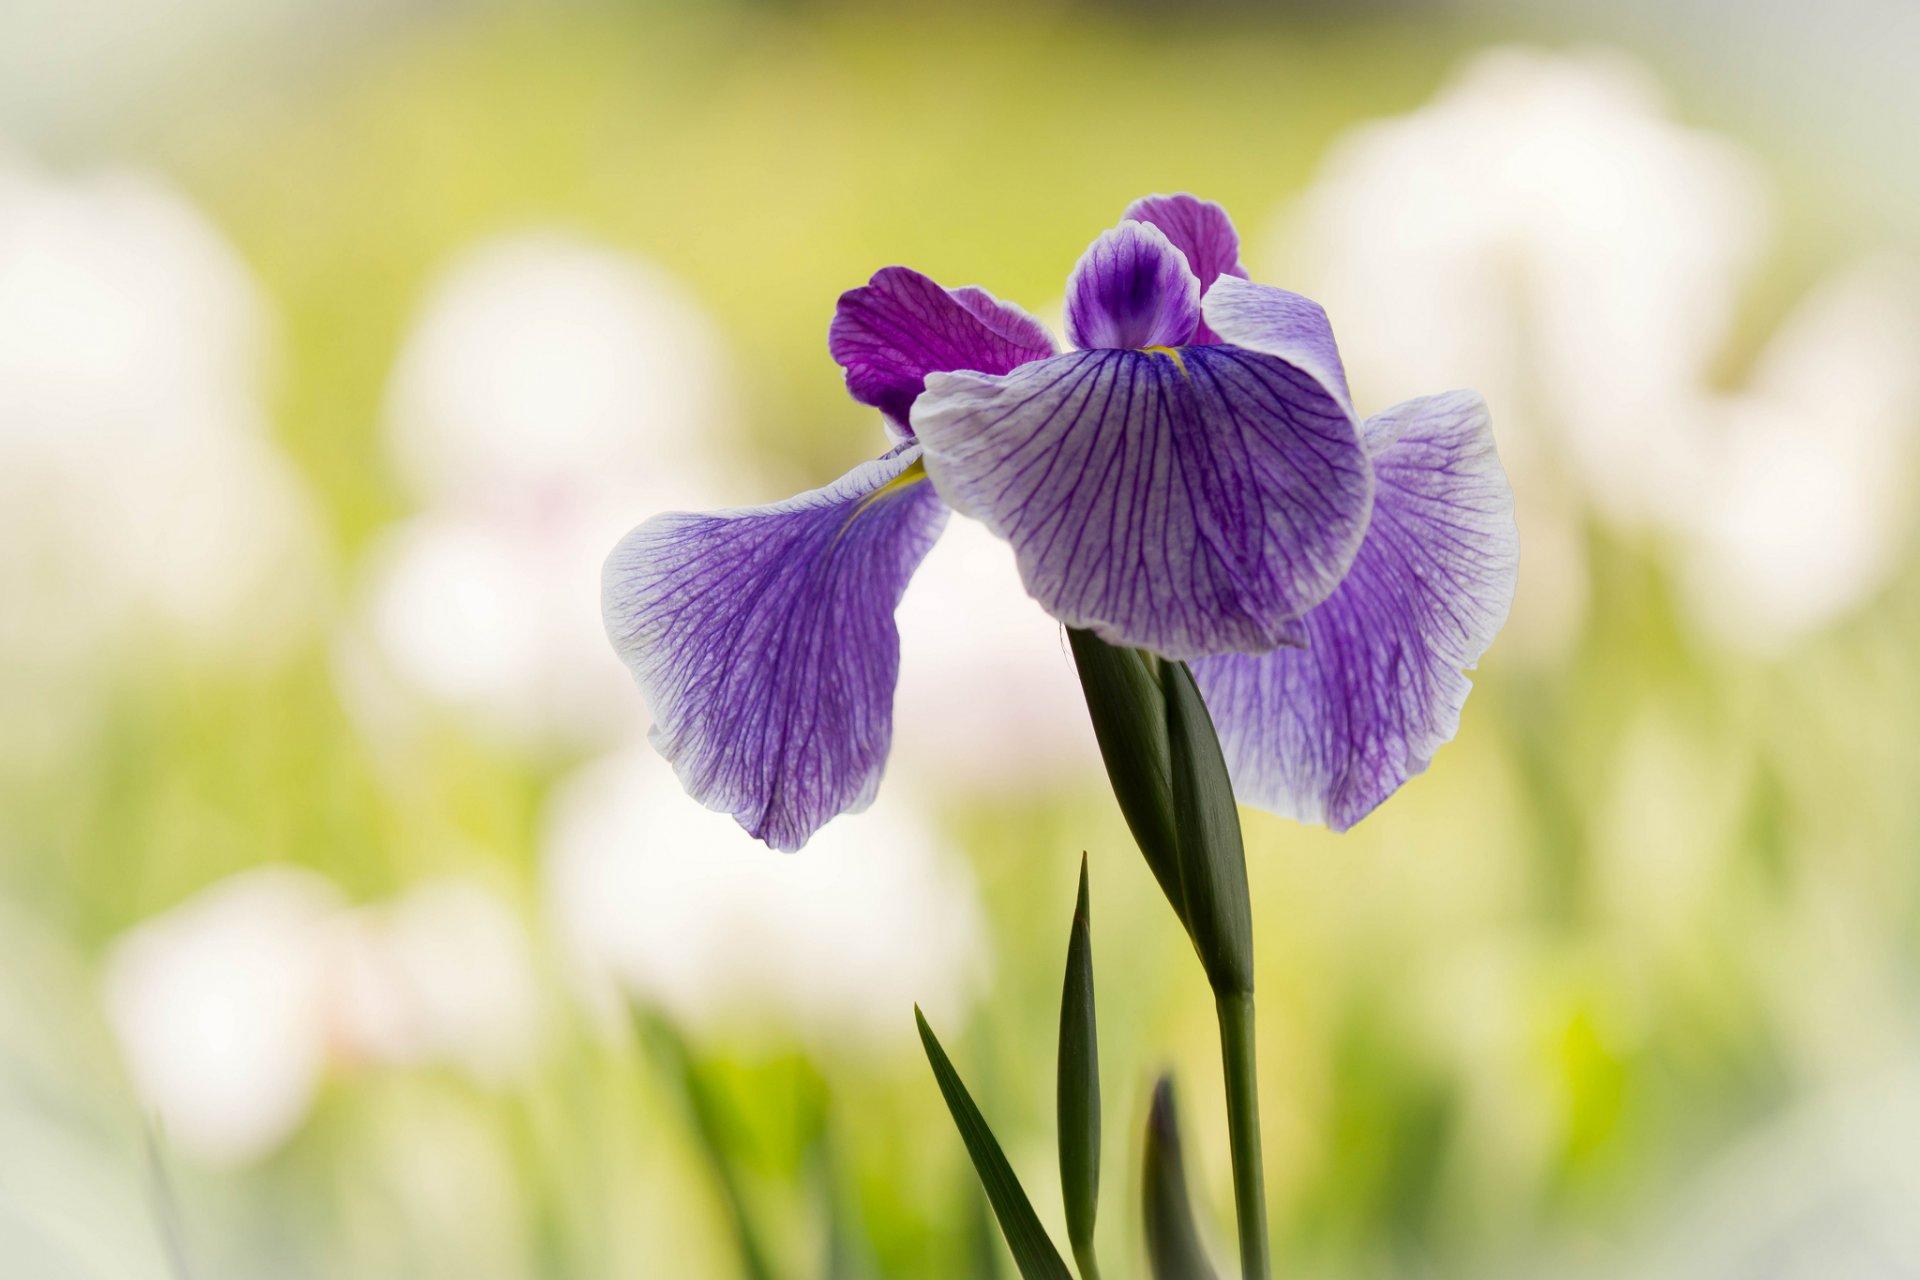 шмель,ирис,цветок,лето  № 529539 бесплатно